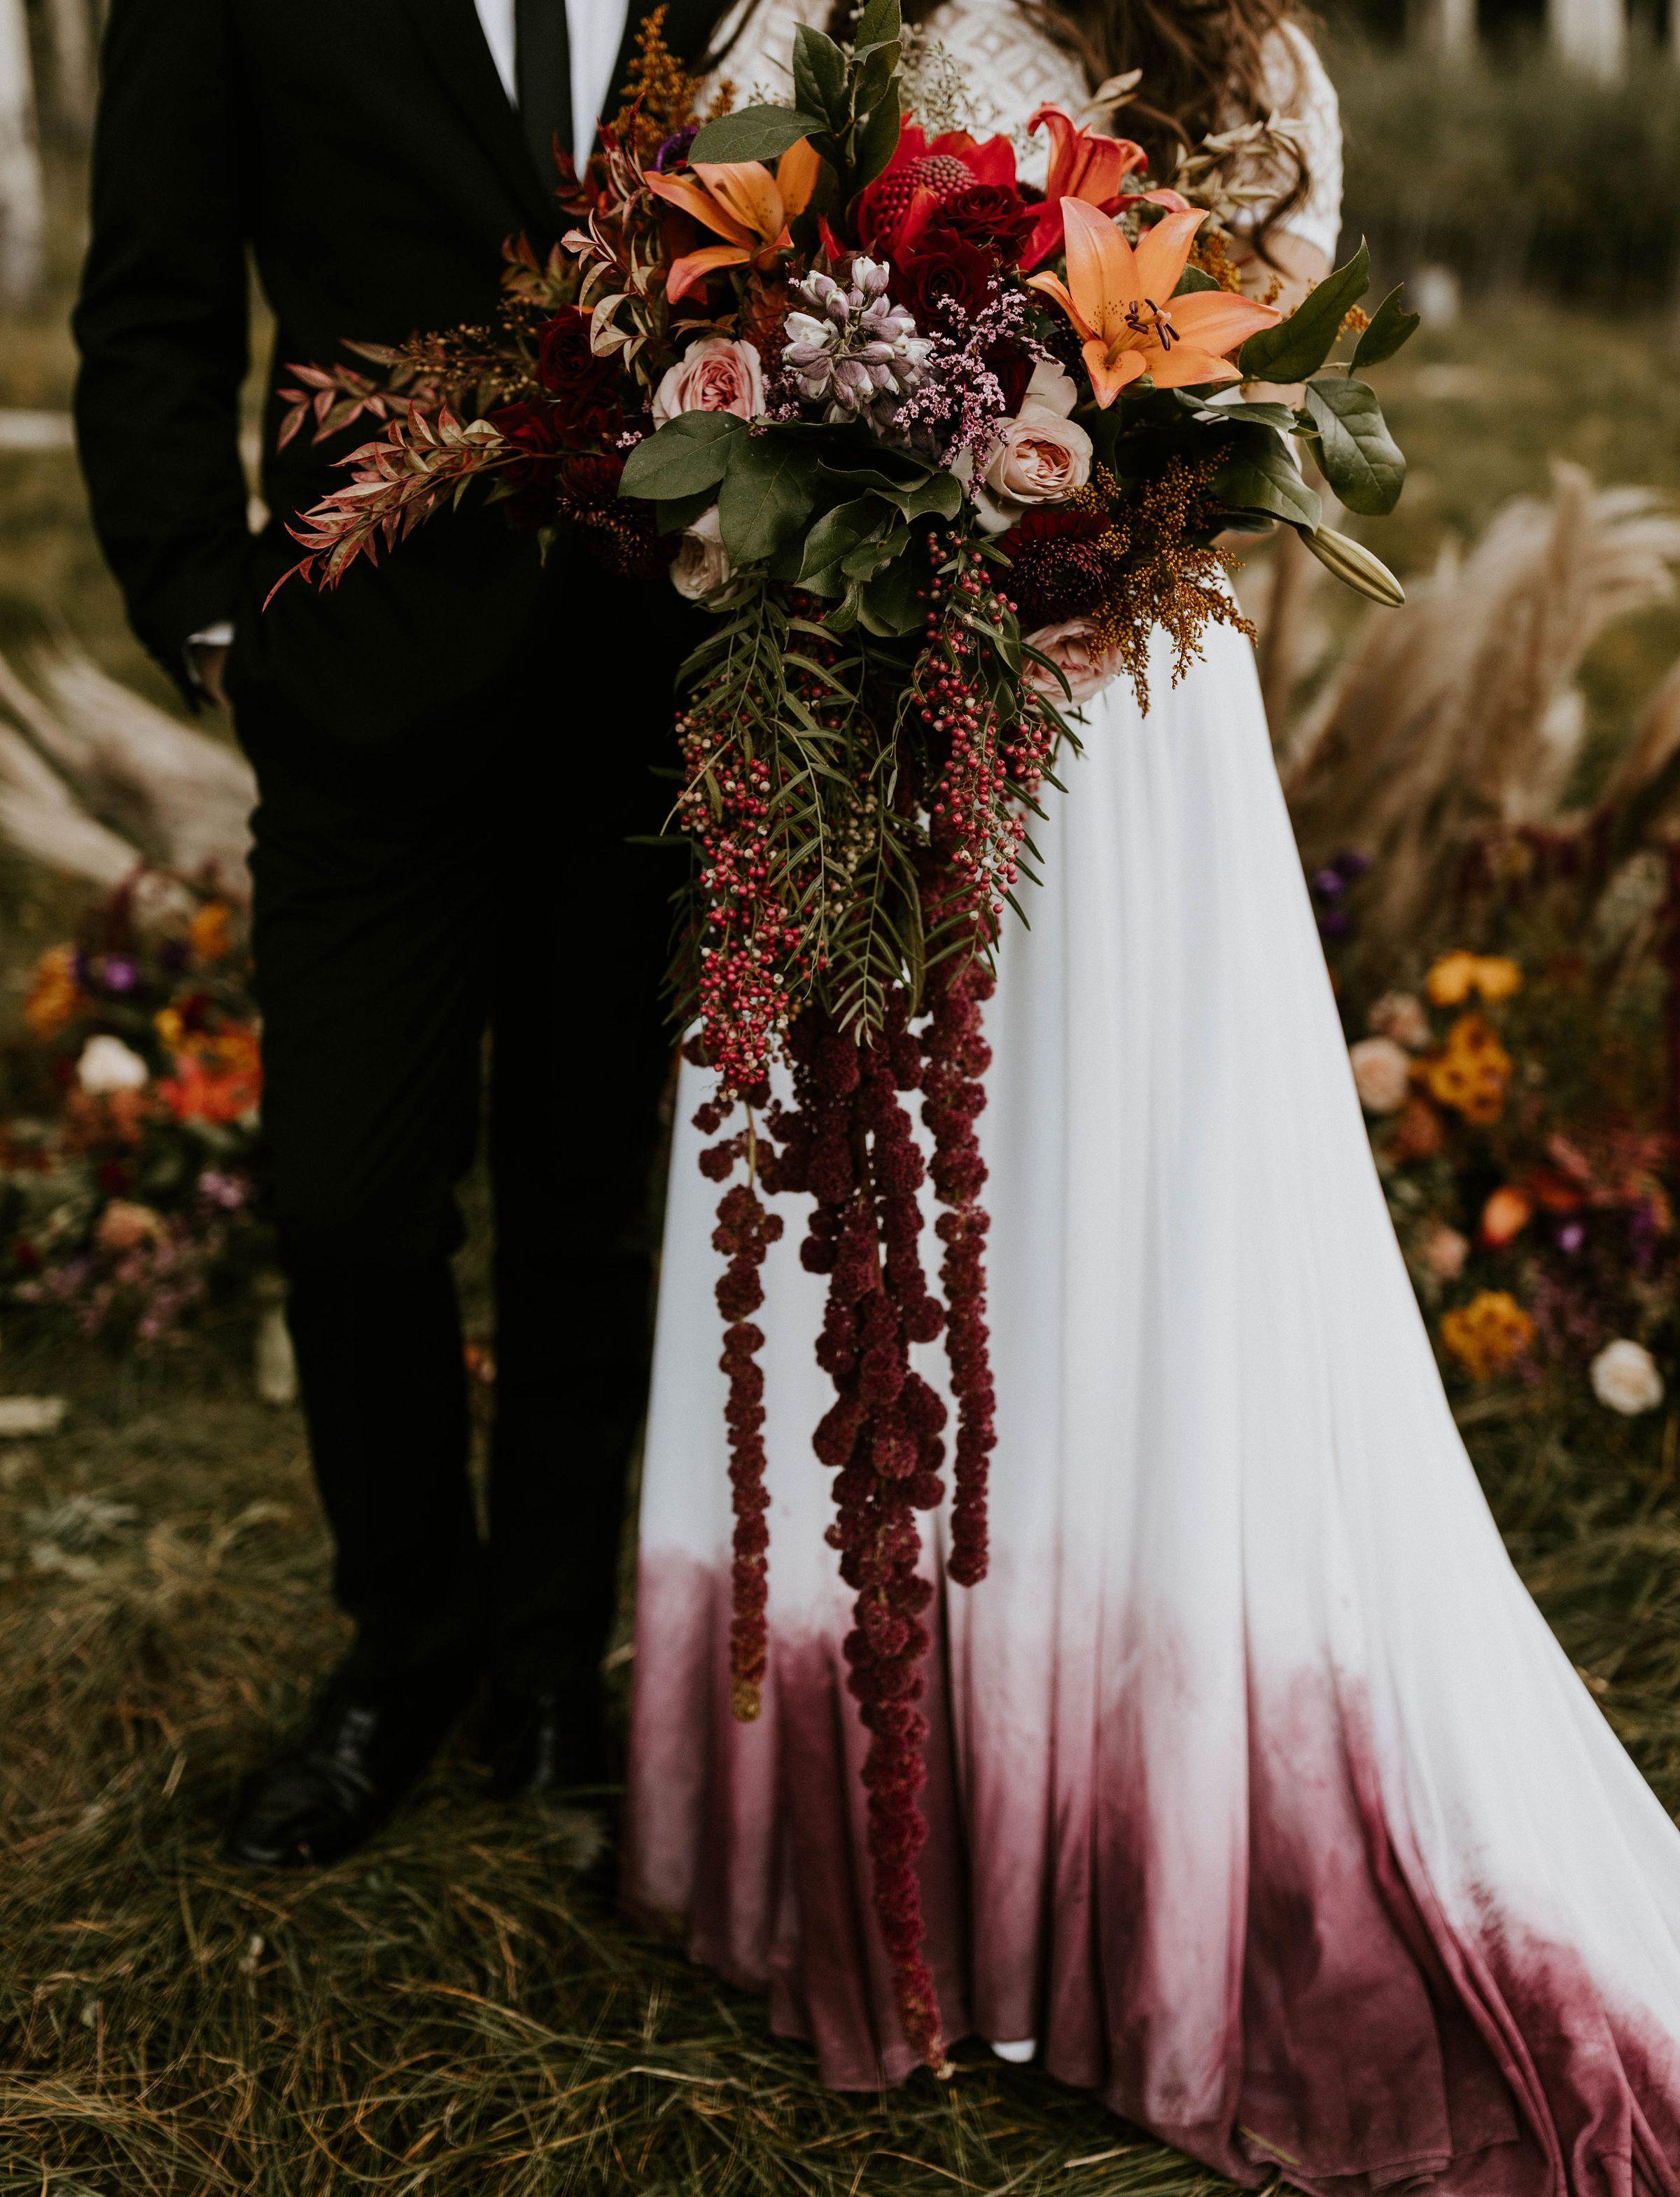 Dreamy Autumn Colors An Ombre Wedding Skirt Pagan